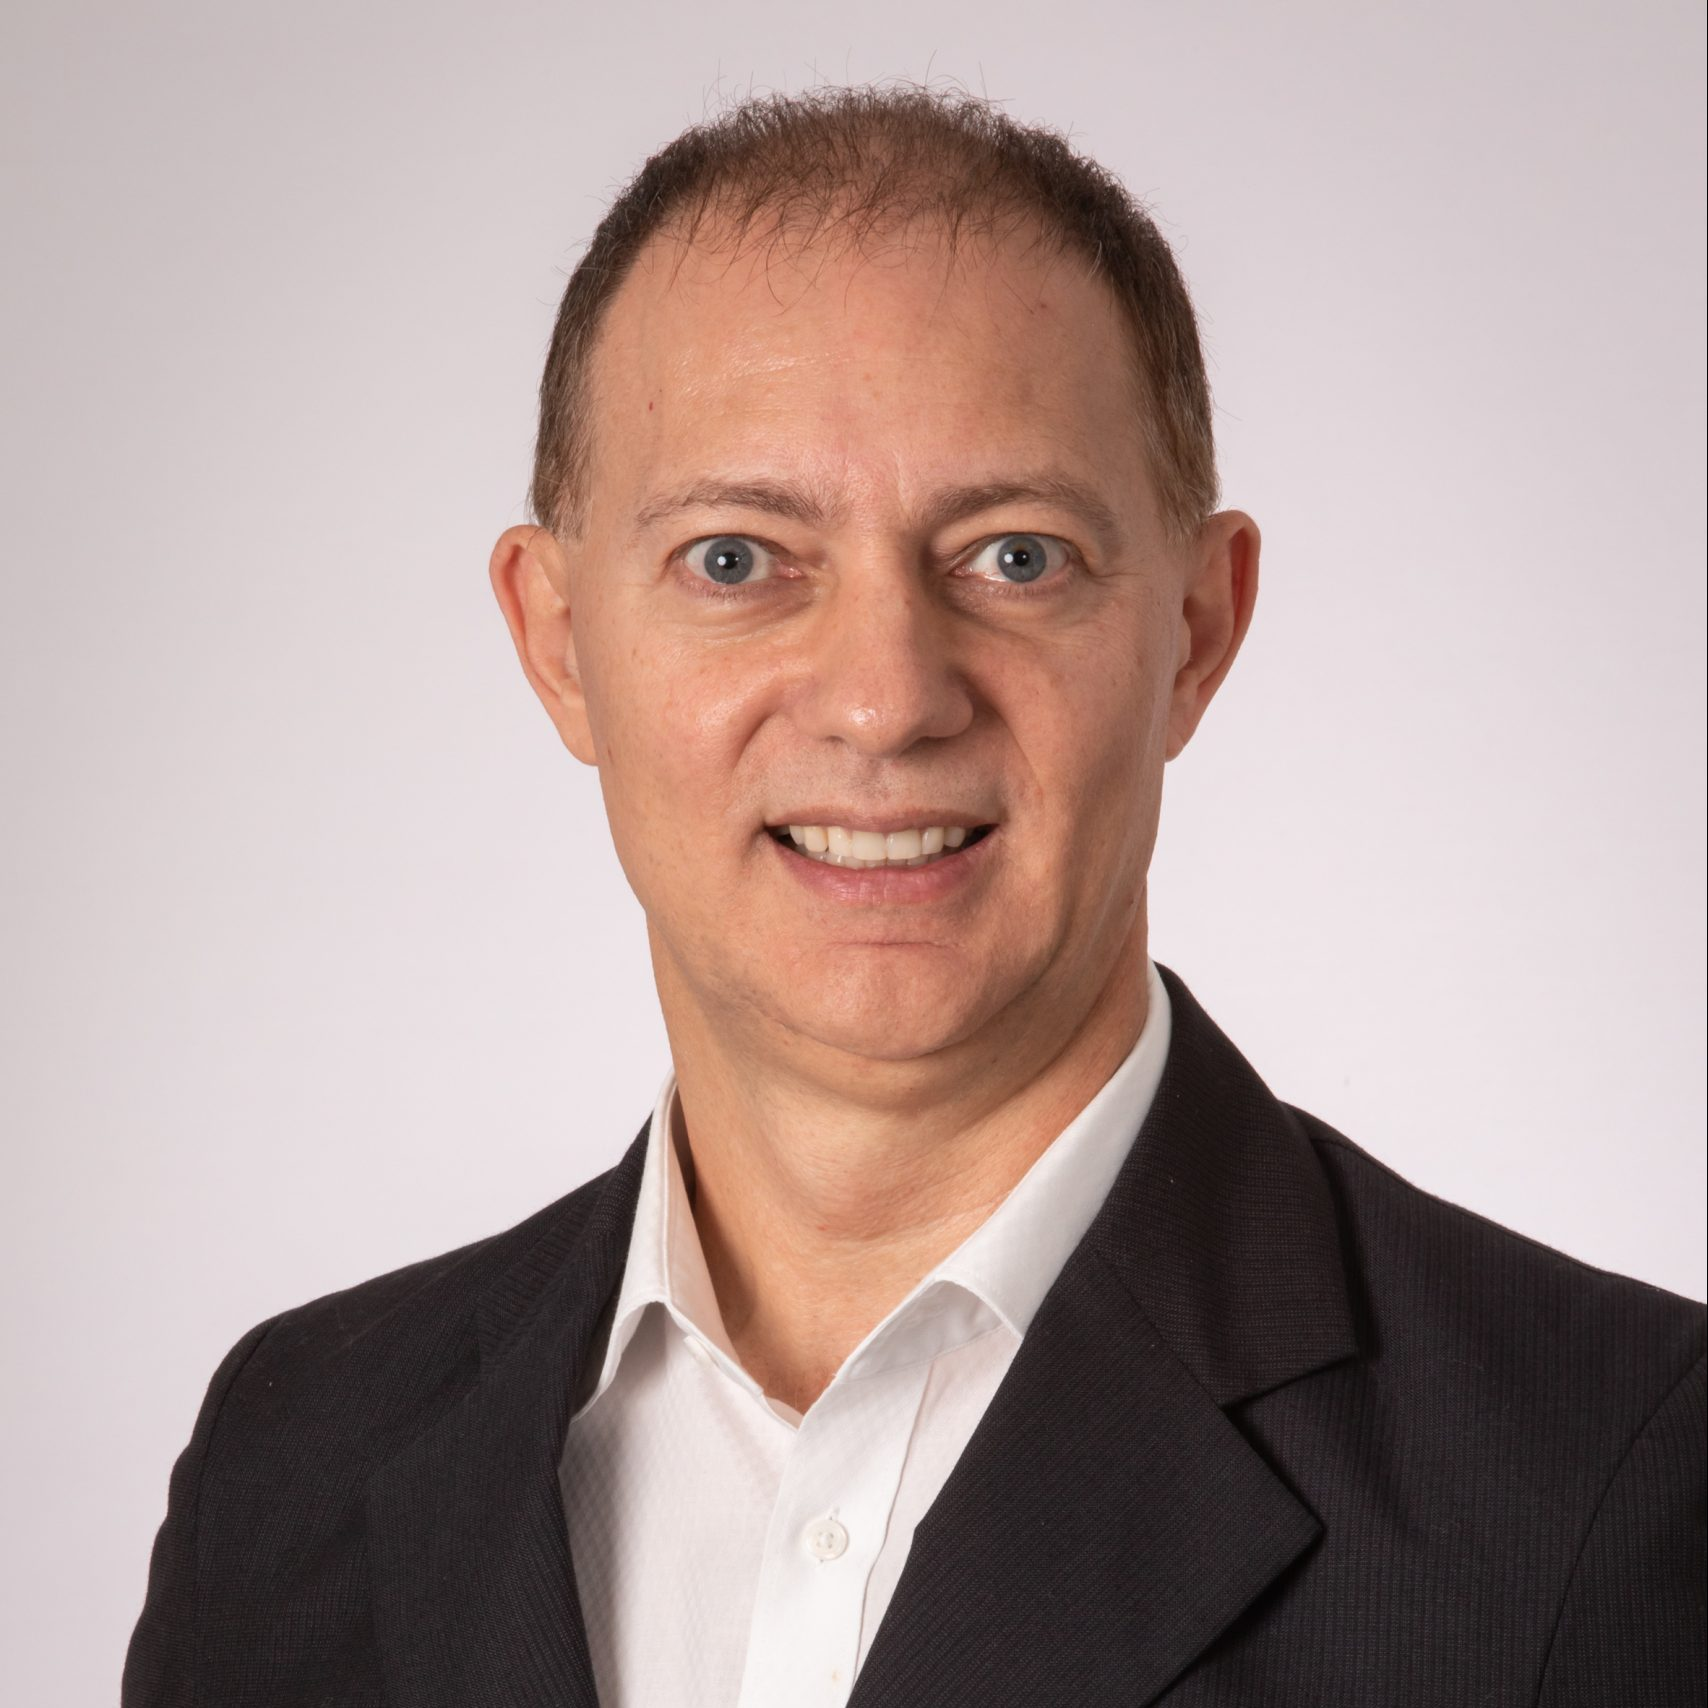 Evandro Luiz Maggio